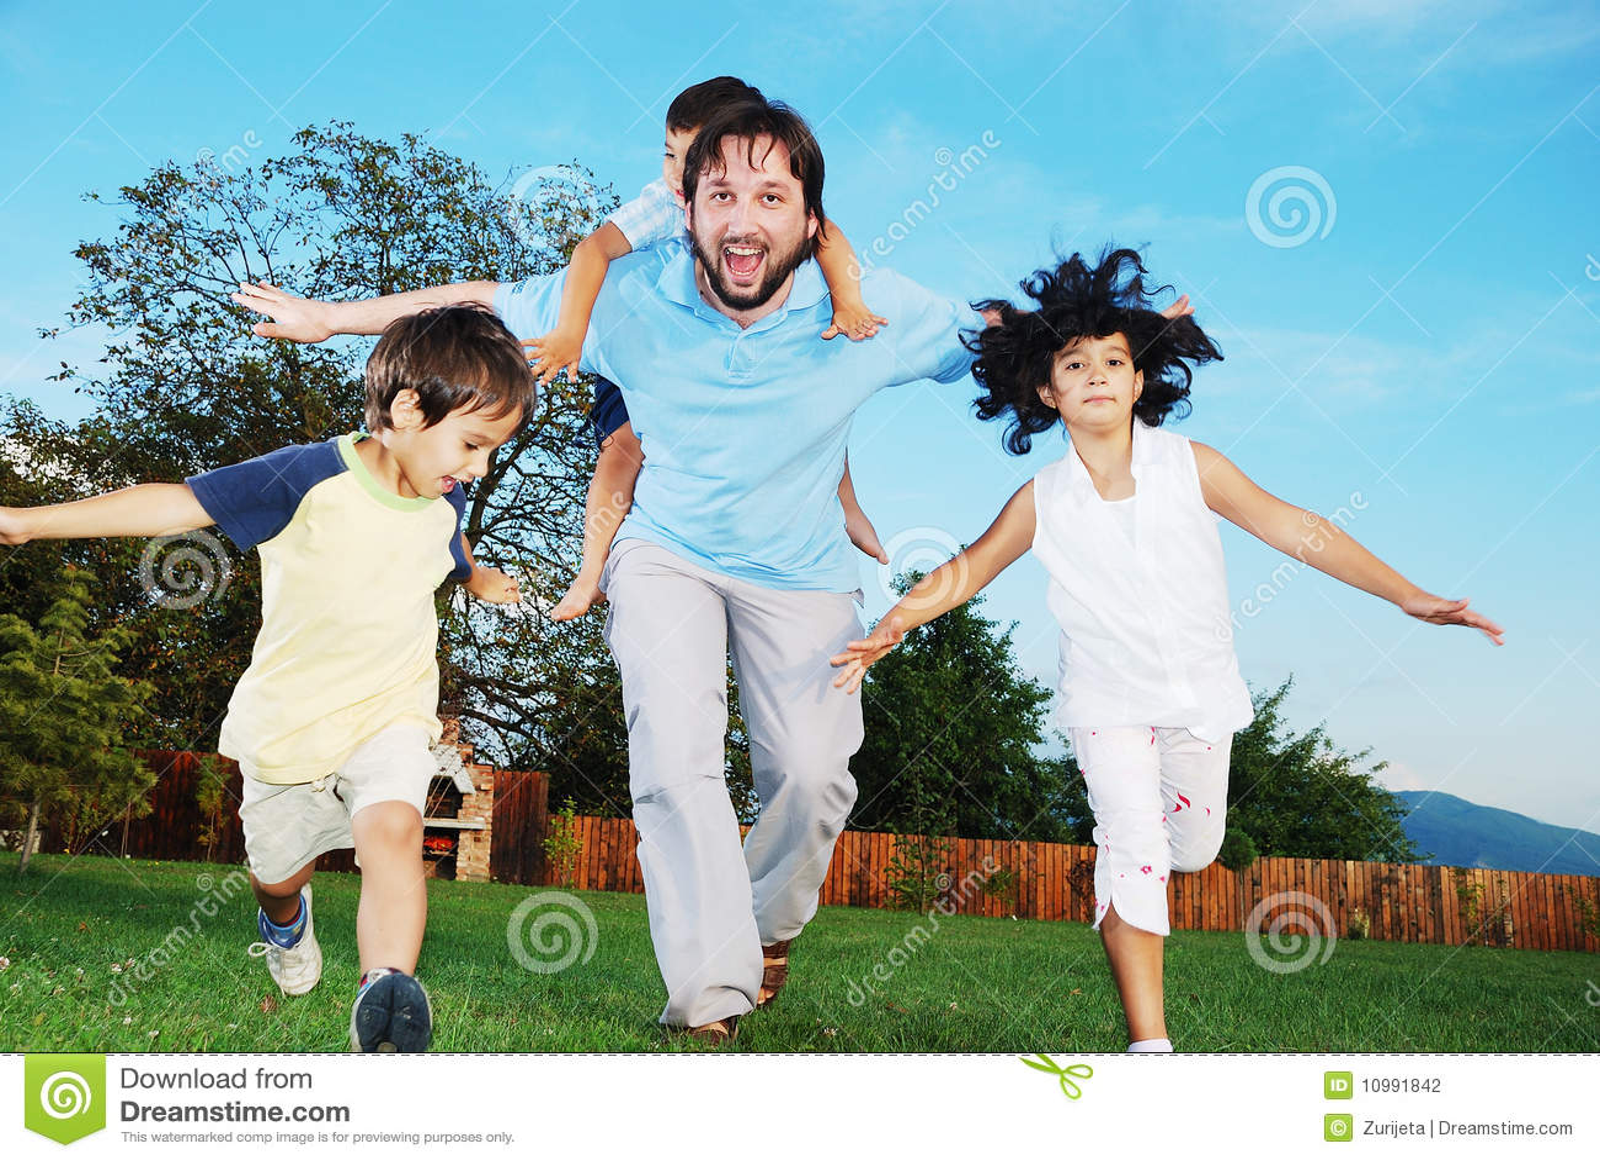 Happy family running outdoor, on beautiful garden